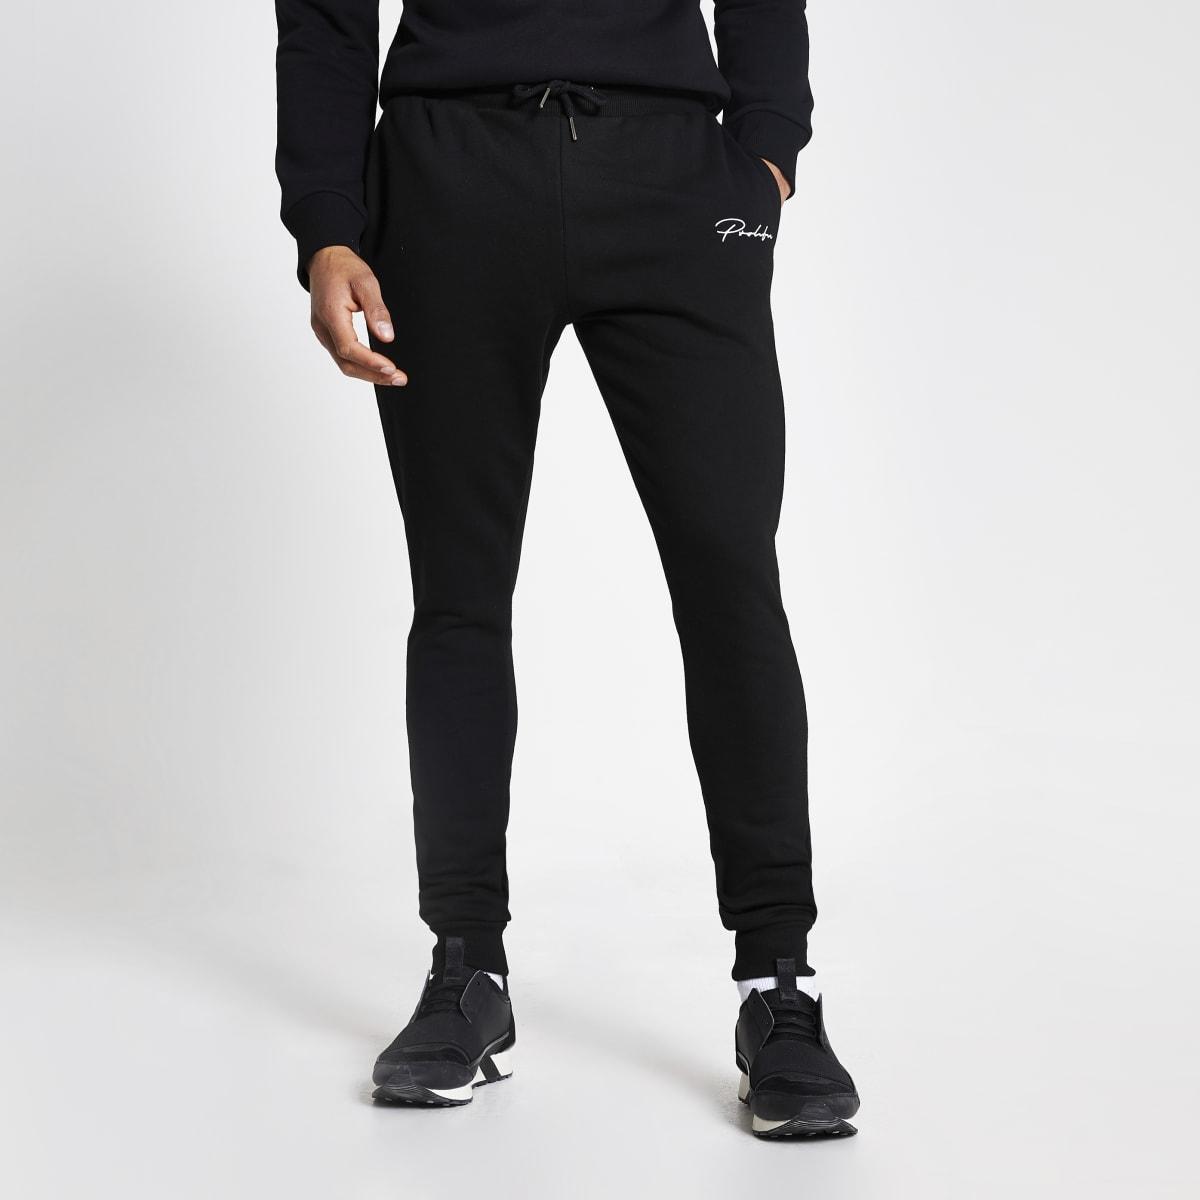 Prolific - Zwarte muscle-fit joggingbroek